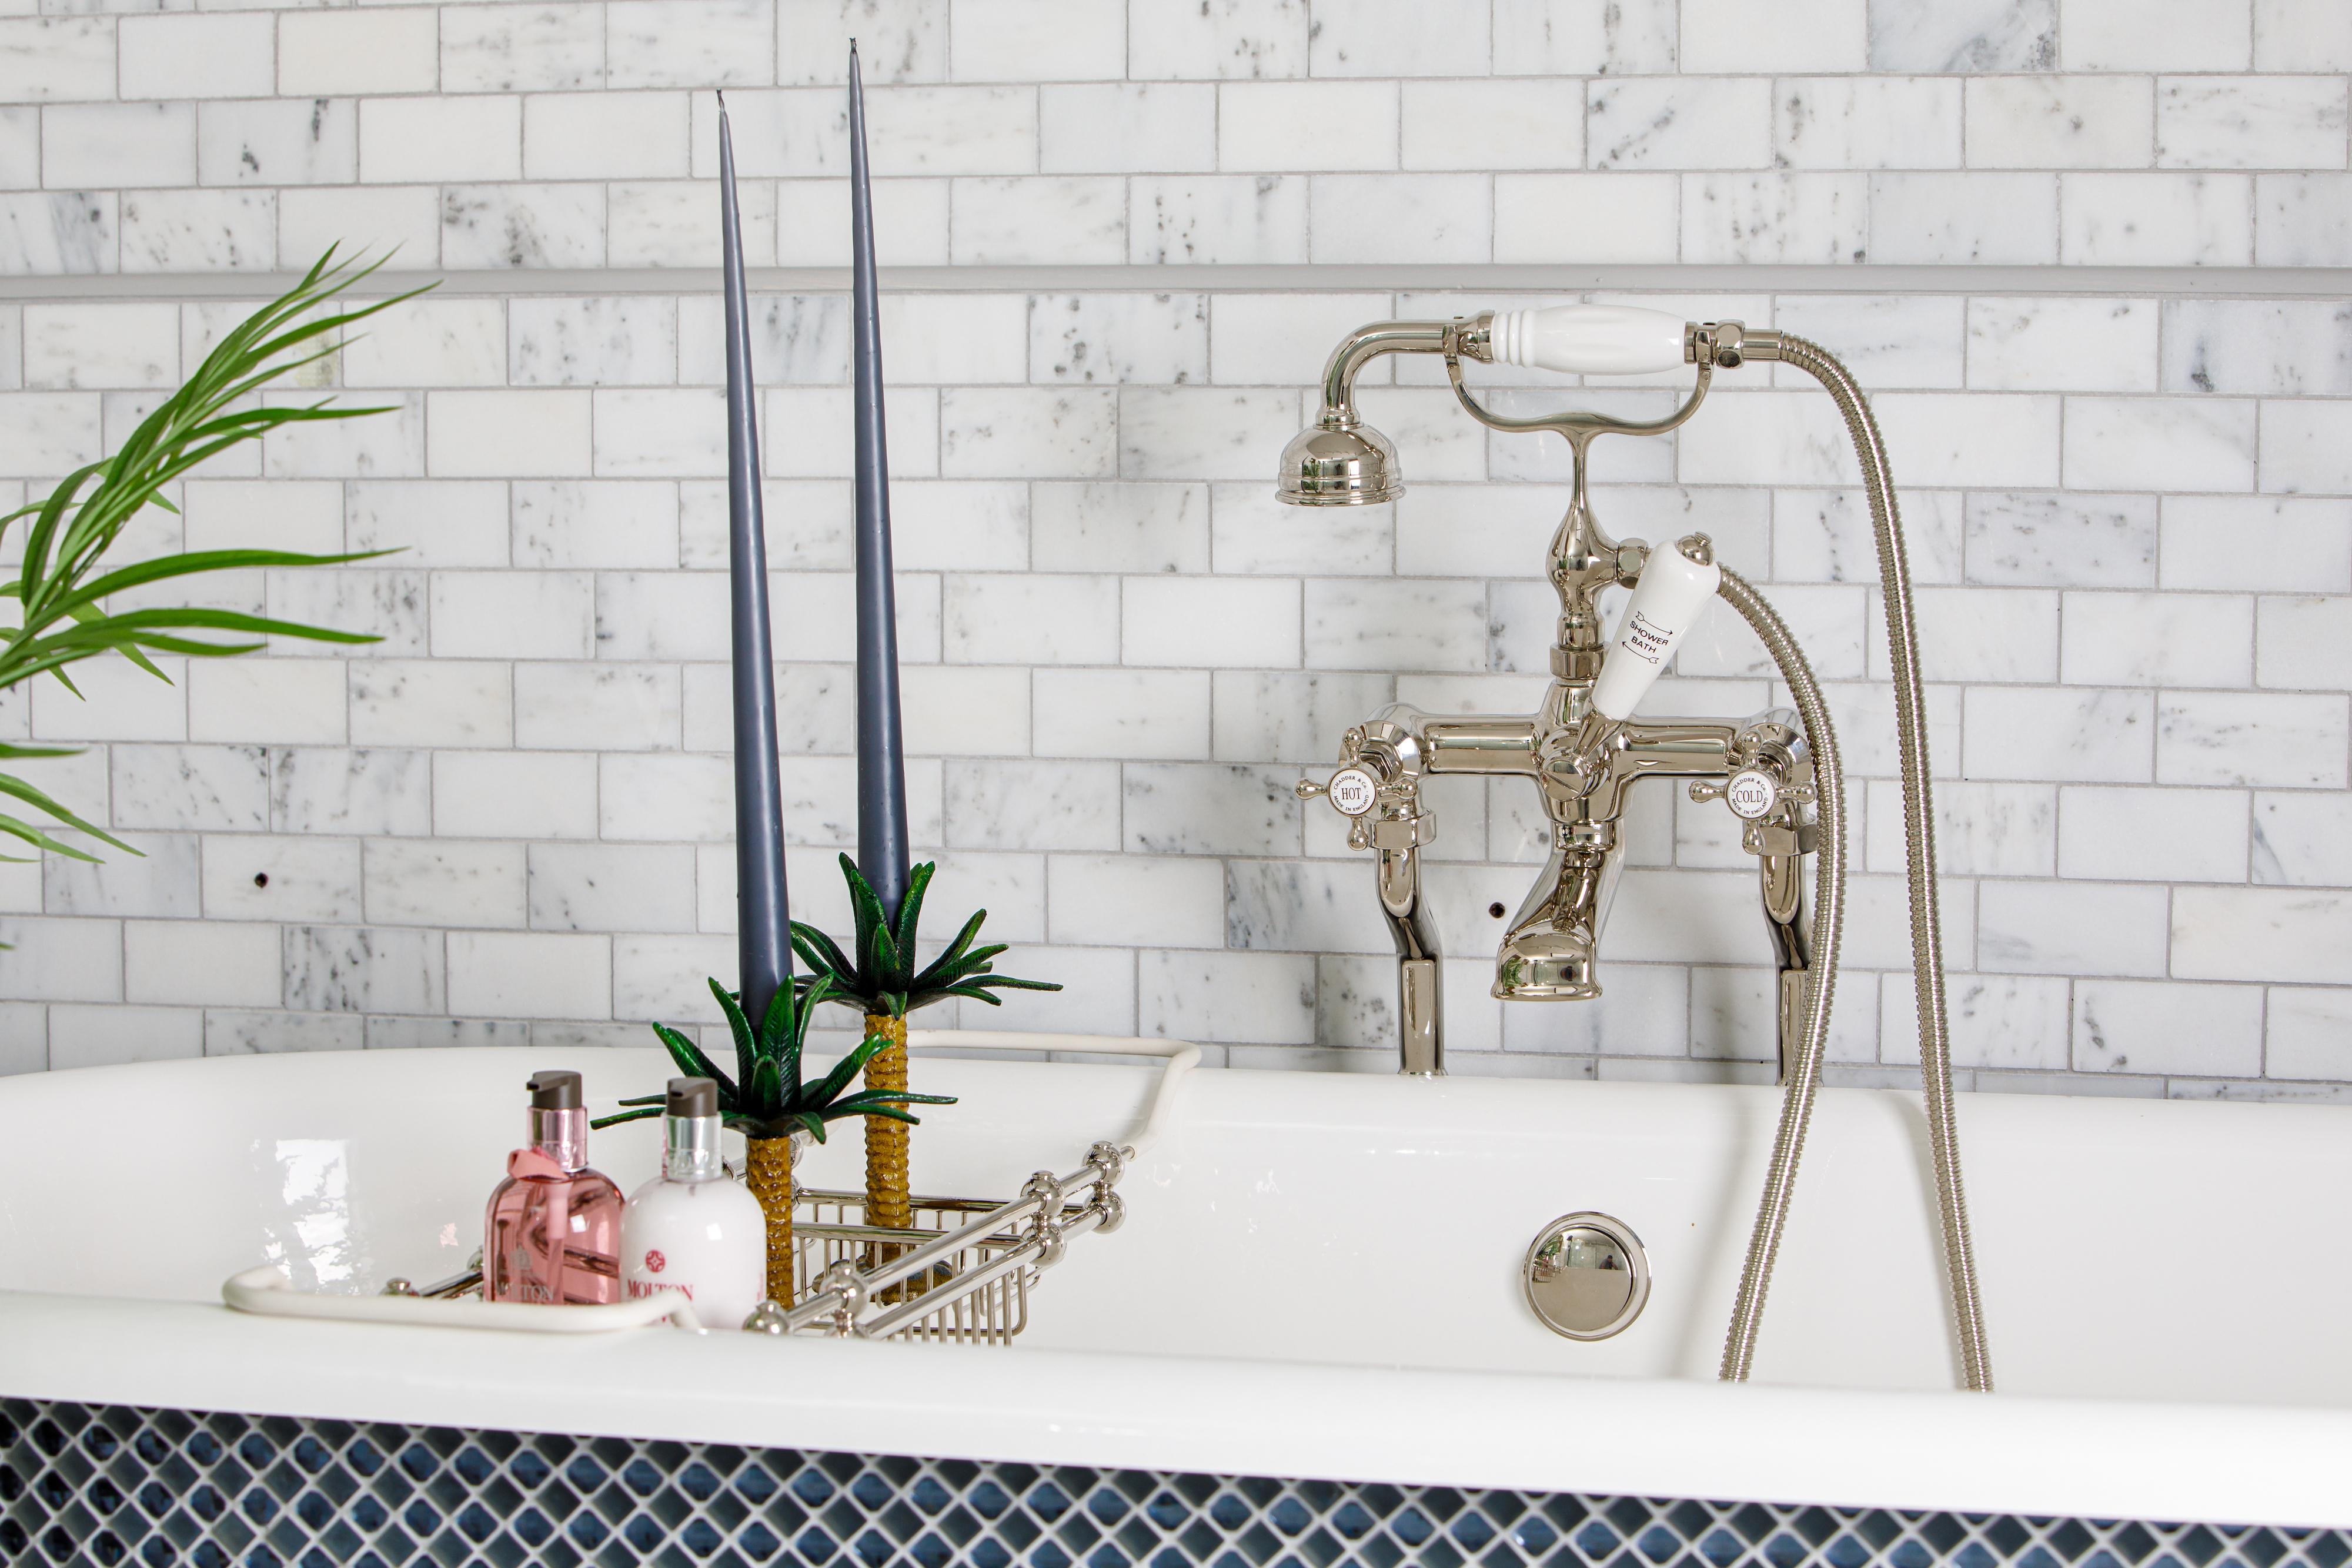 bath shower mixer in nickel finish traditional bathroom design